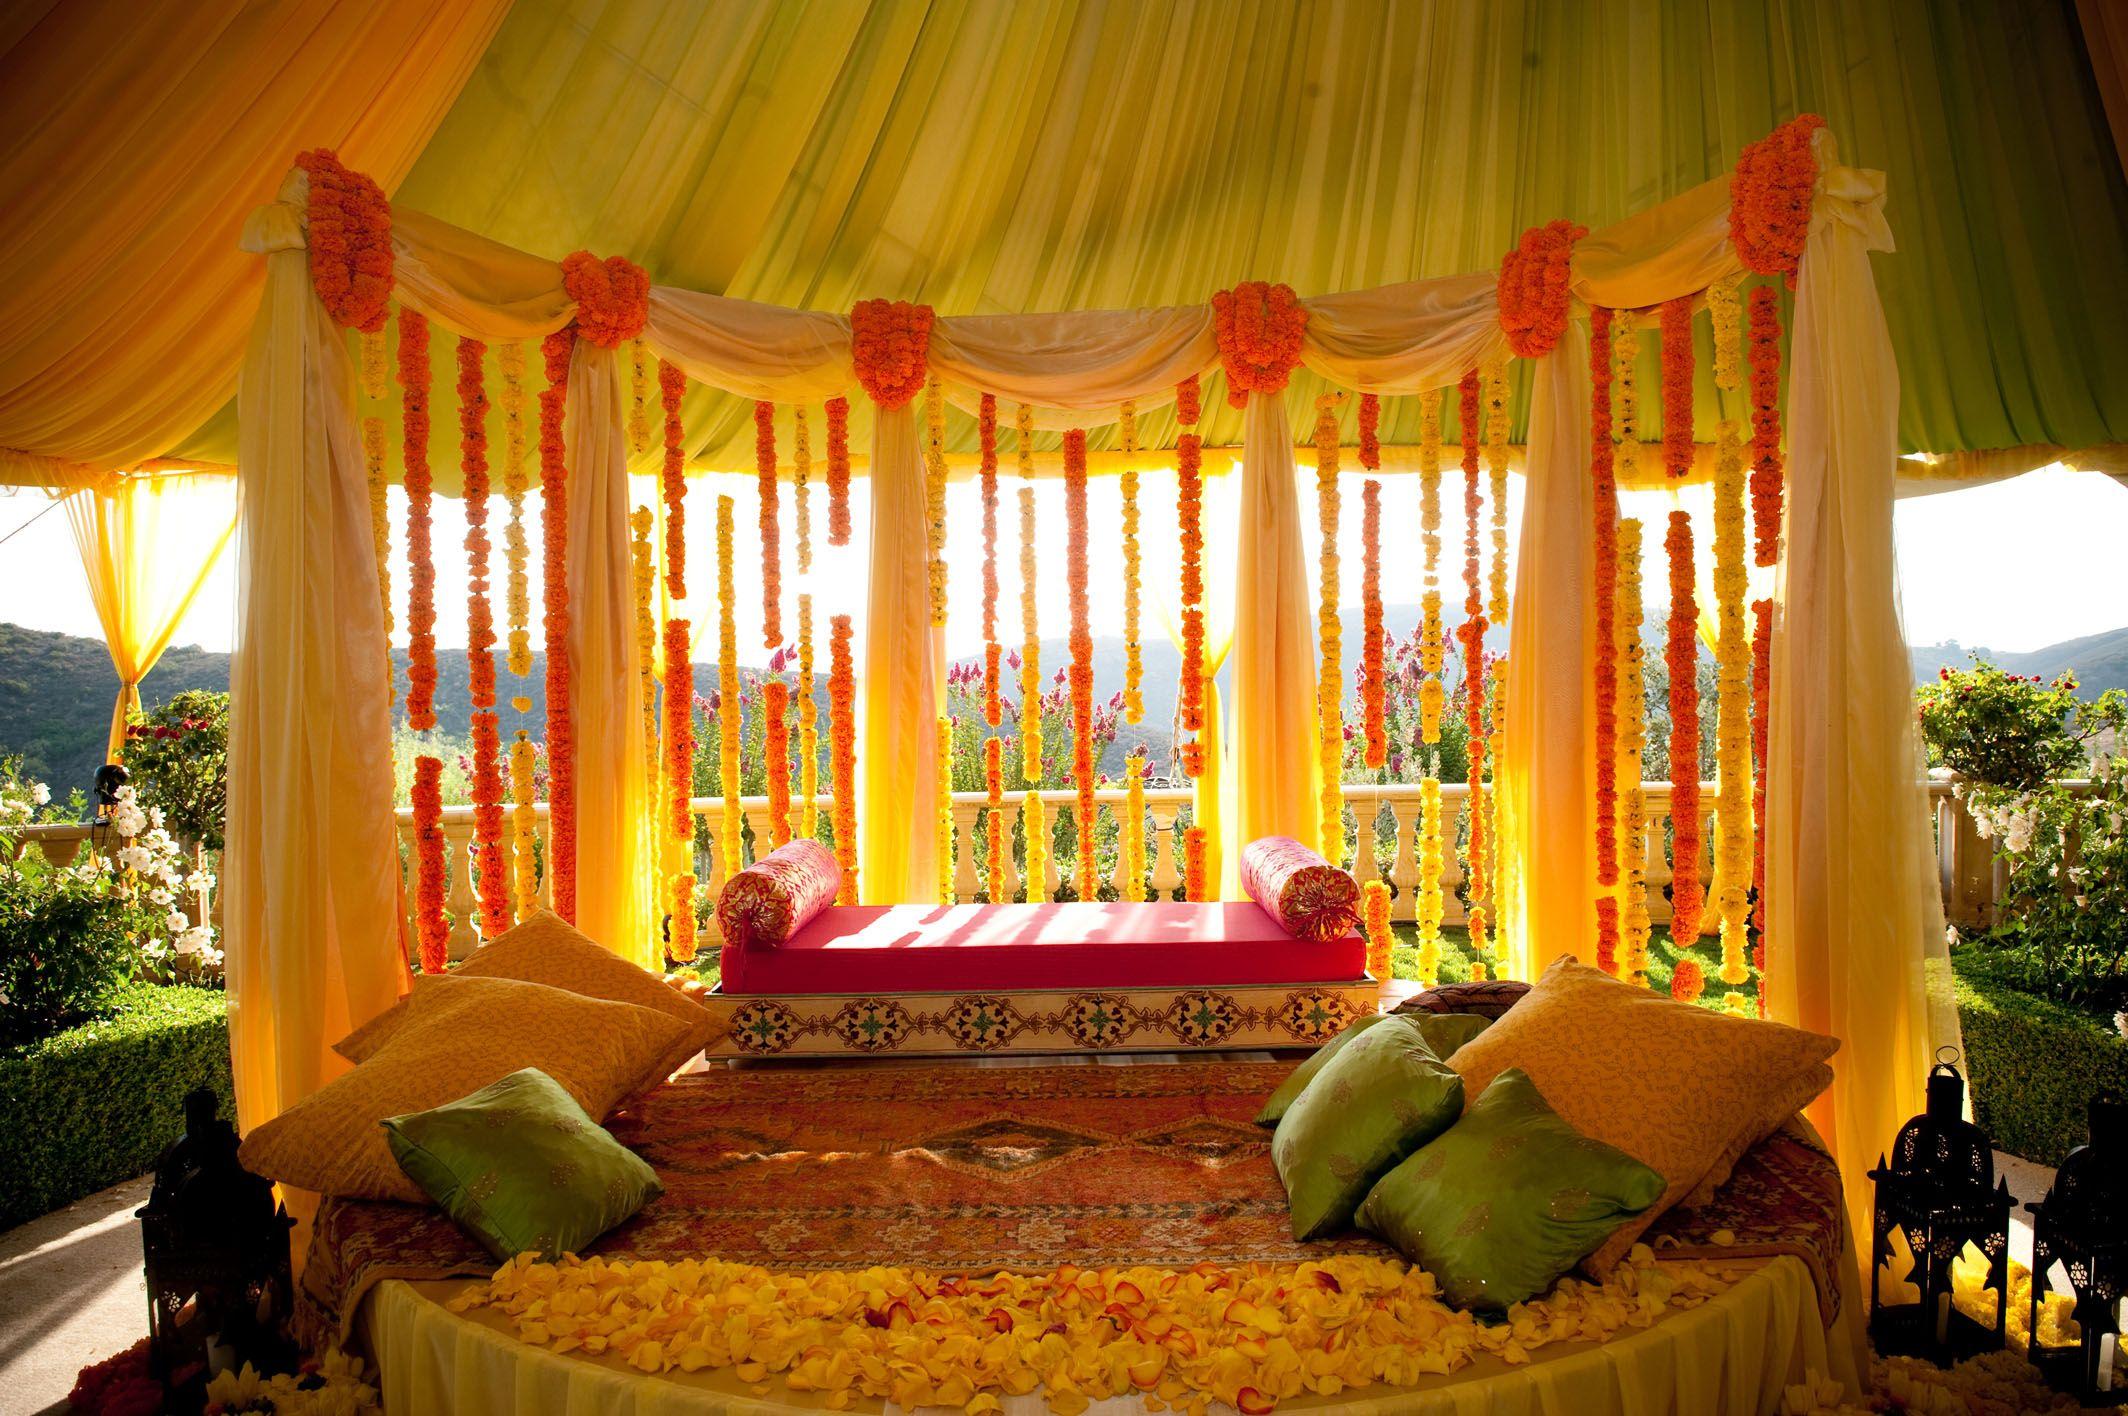 Mehndi Decoration At Home With Flowers : Indian weddings mehendi decor wedding decorator muslim